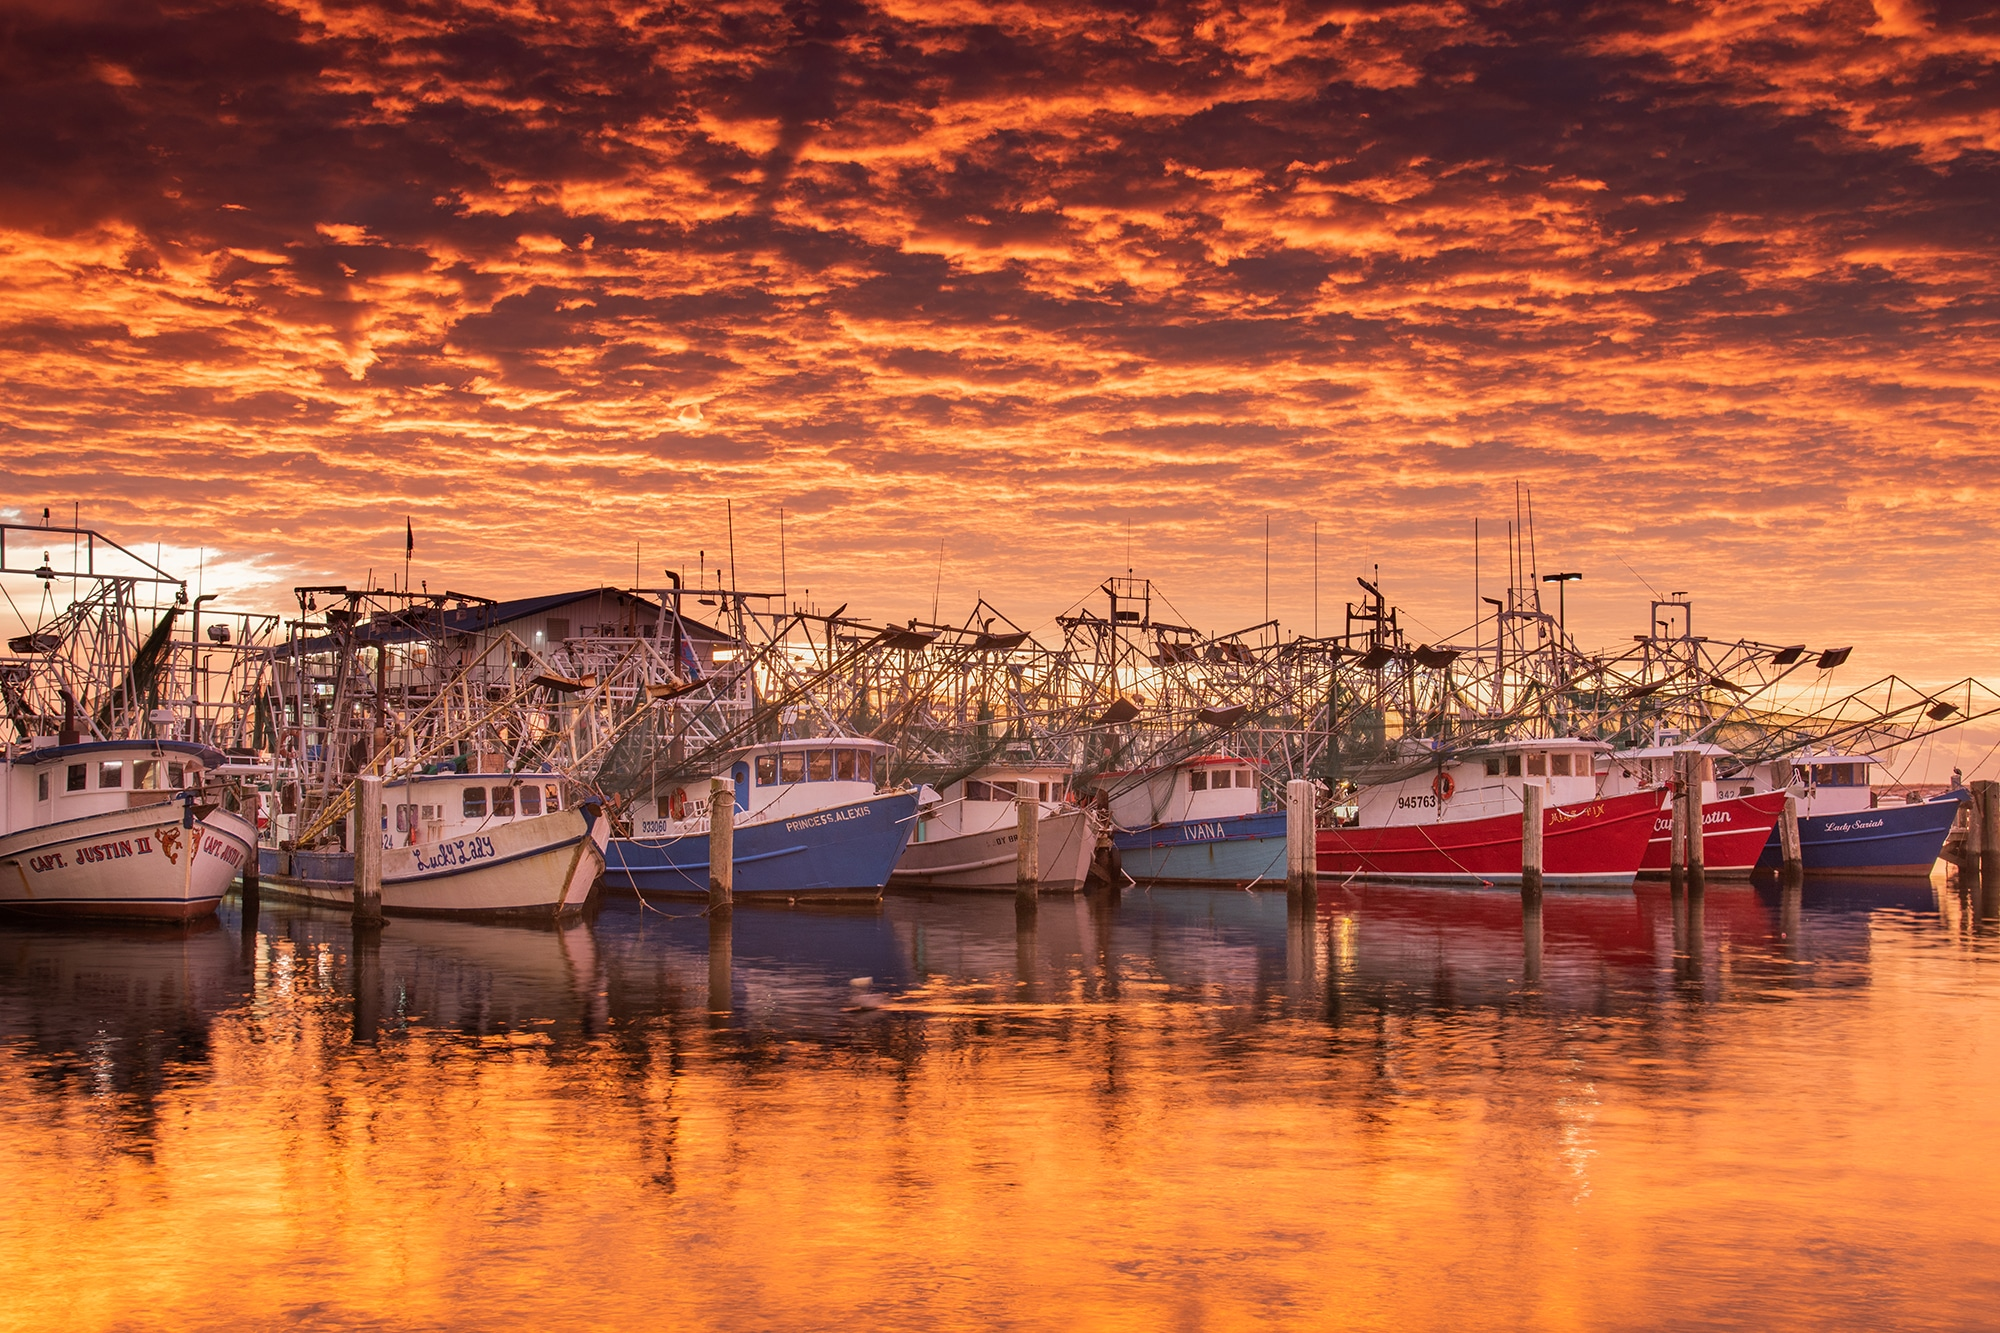 Harbor photo by Alex North